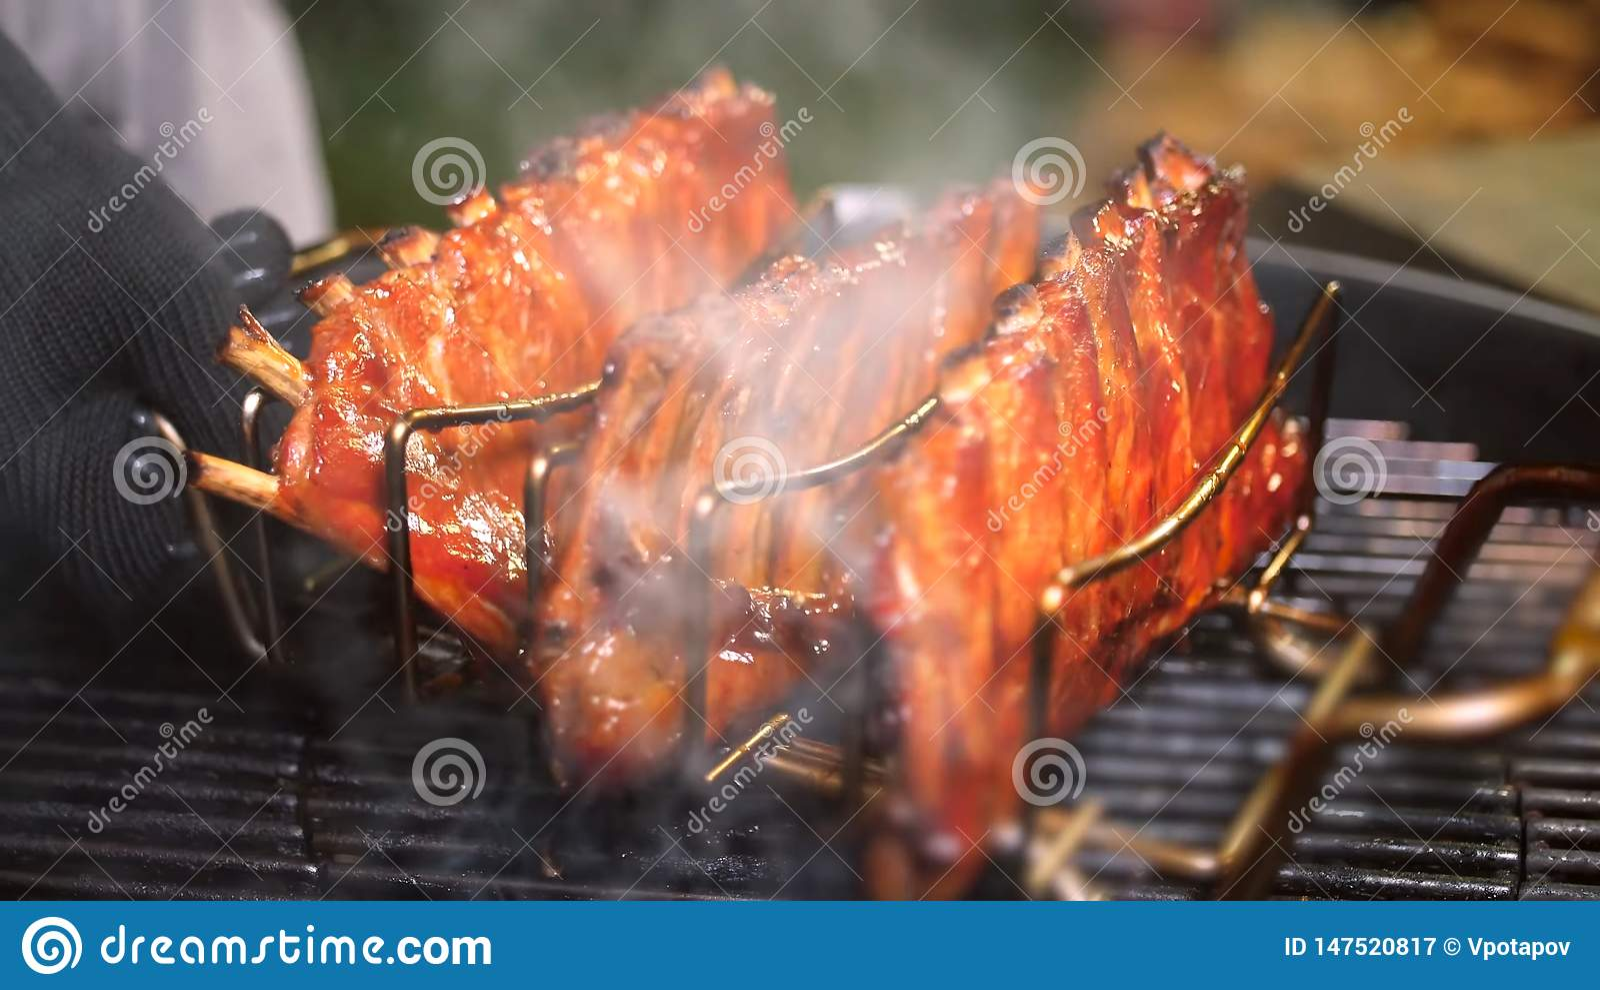 Nervures de porc grill?es Viande, juteuse